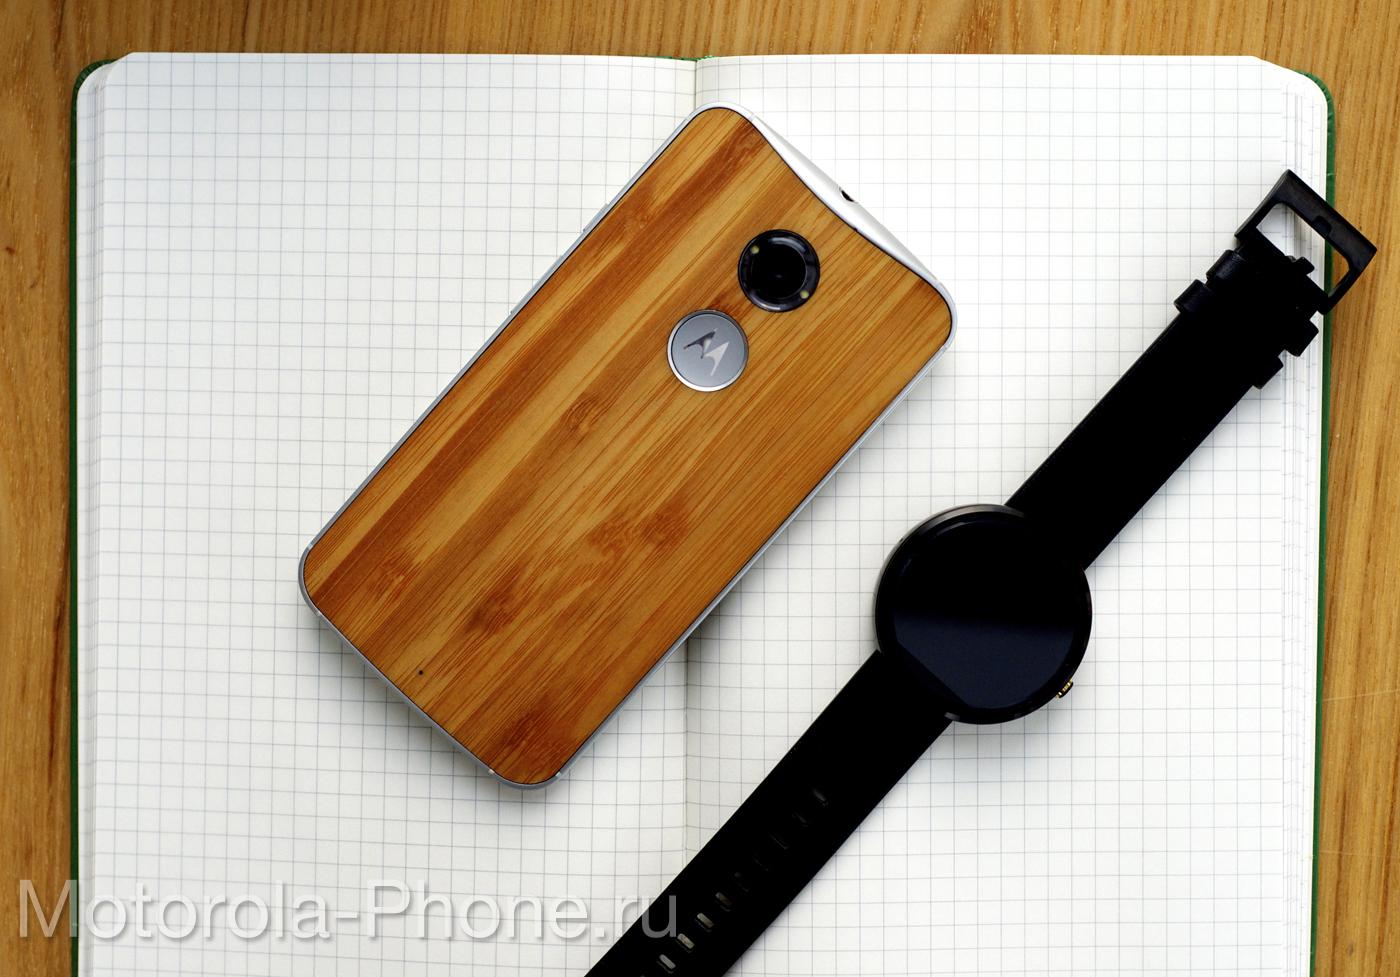 Motorola-Moto-X-Bamboo-10